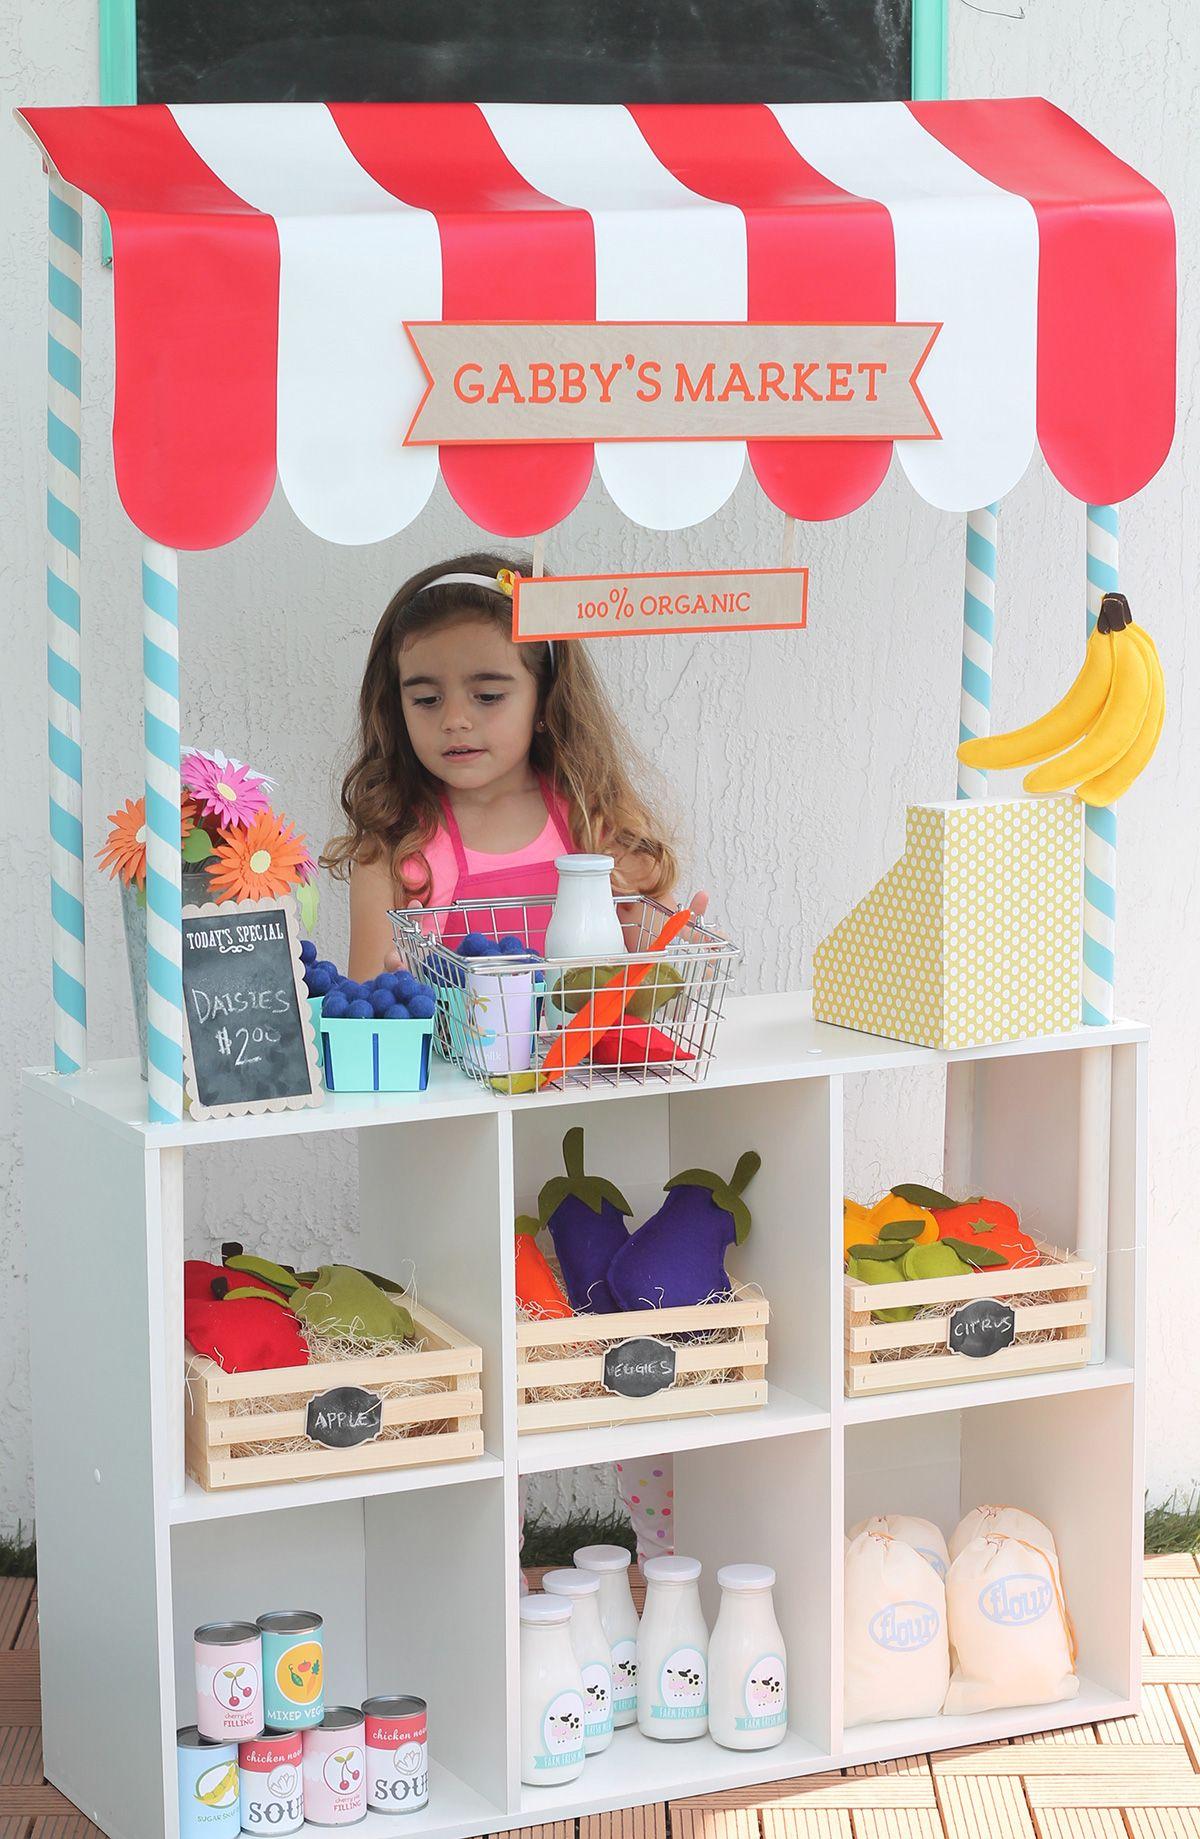 repurposed bookshelf ideas play market pretend play and kids s repurposed bookshelf ideas